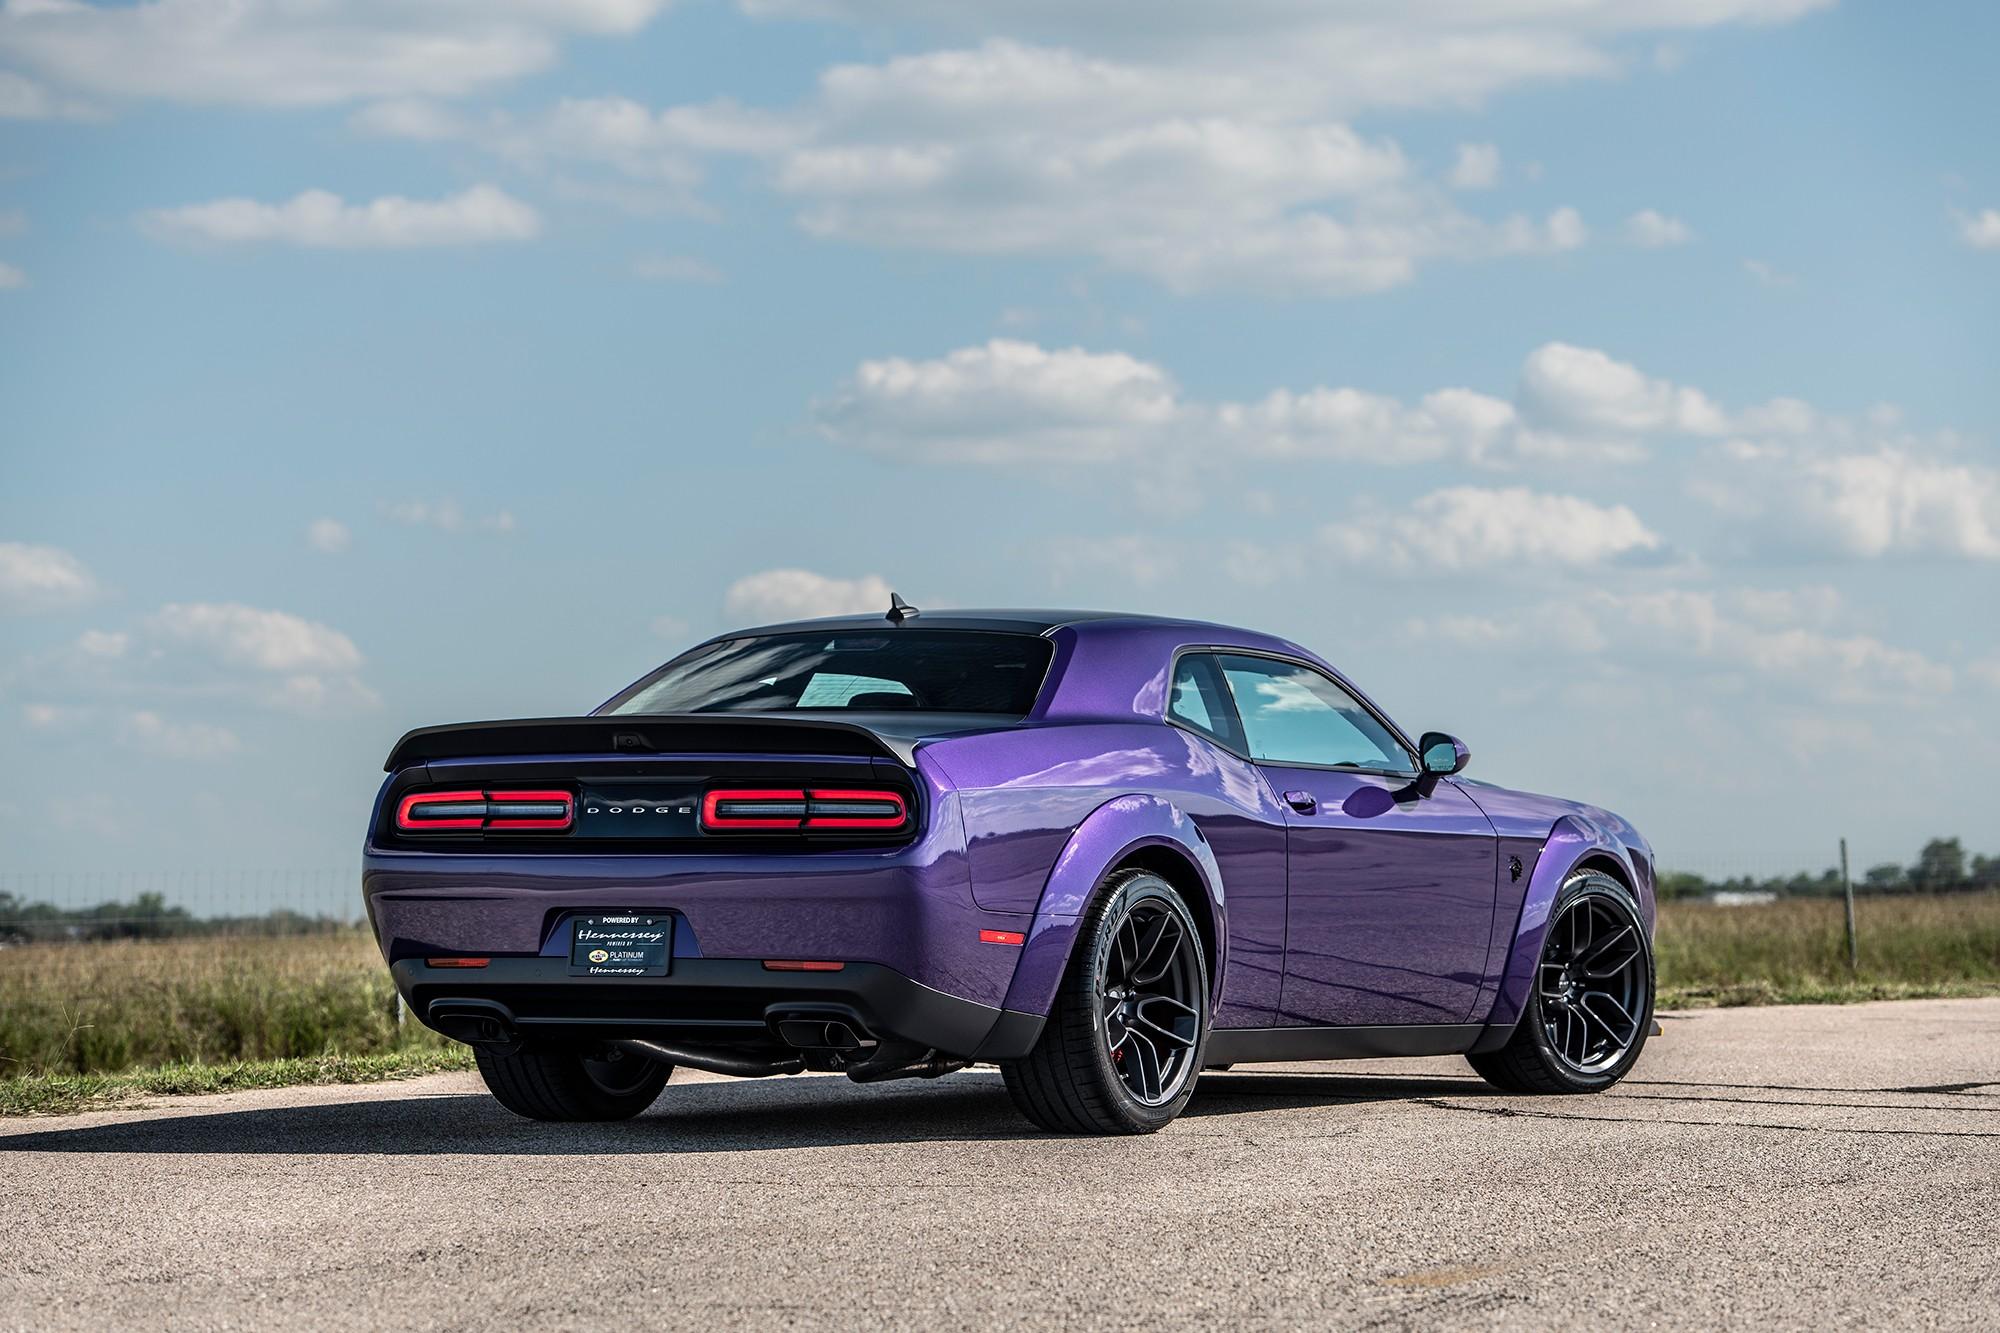 Hennessey Reveals 1200hp Dodge Challenger Hellcat Red Eye - GTspirit